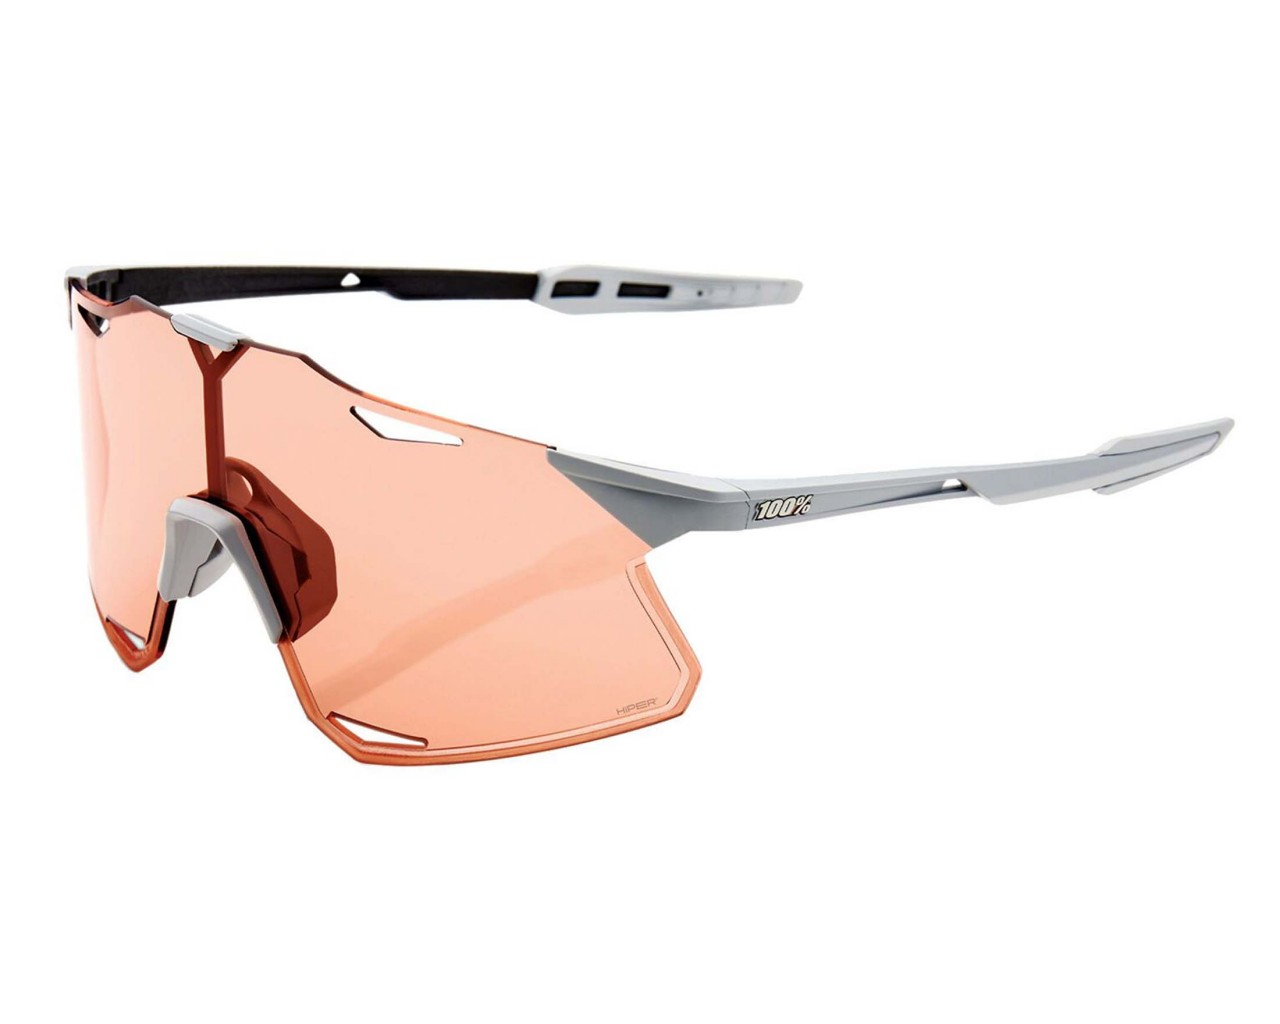 100% Hypercraft - Hiper Lens Sports sunglasses | matt stone grey